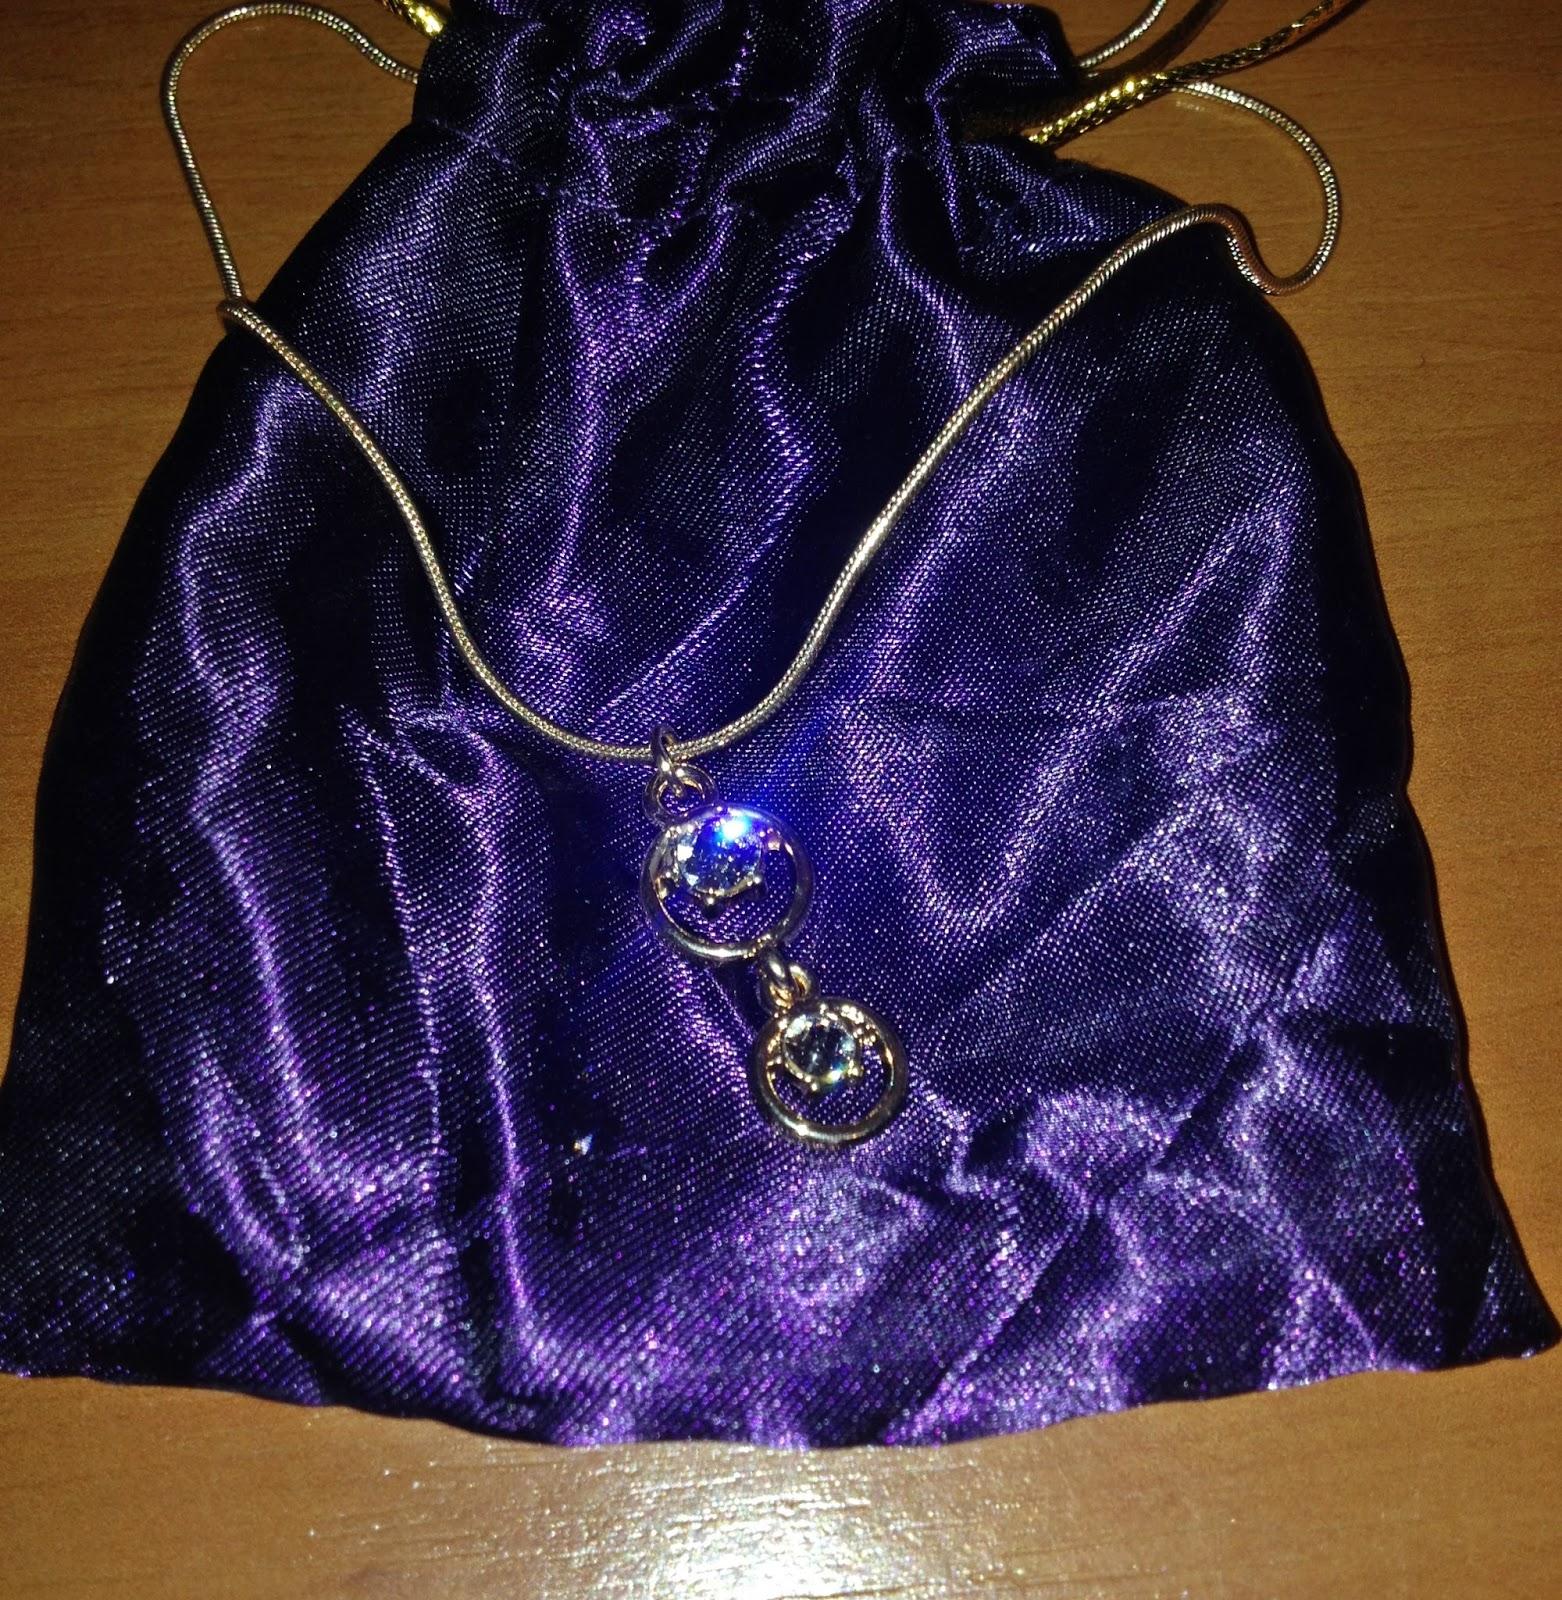 Modne ubrania Secrets in my heart: Biżuteria Avon i Yves Rocher VK71